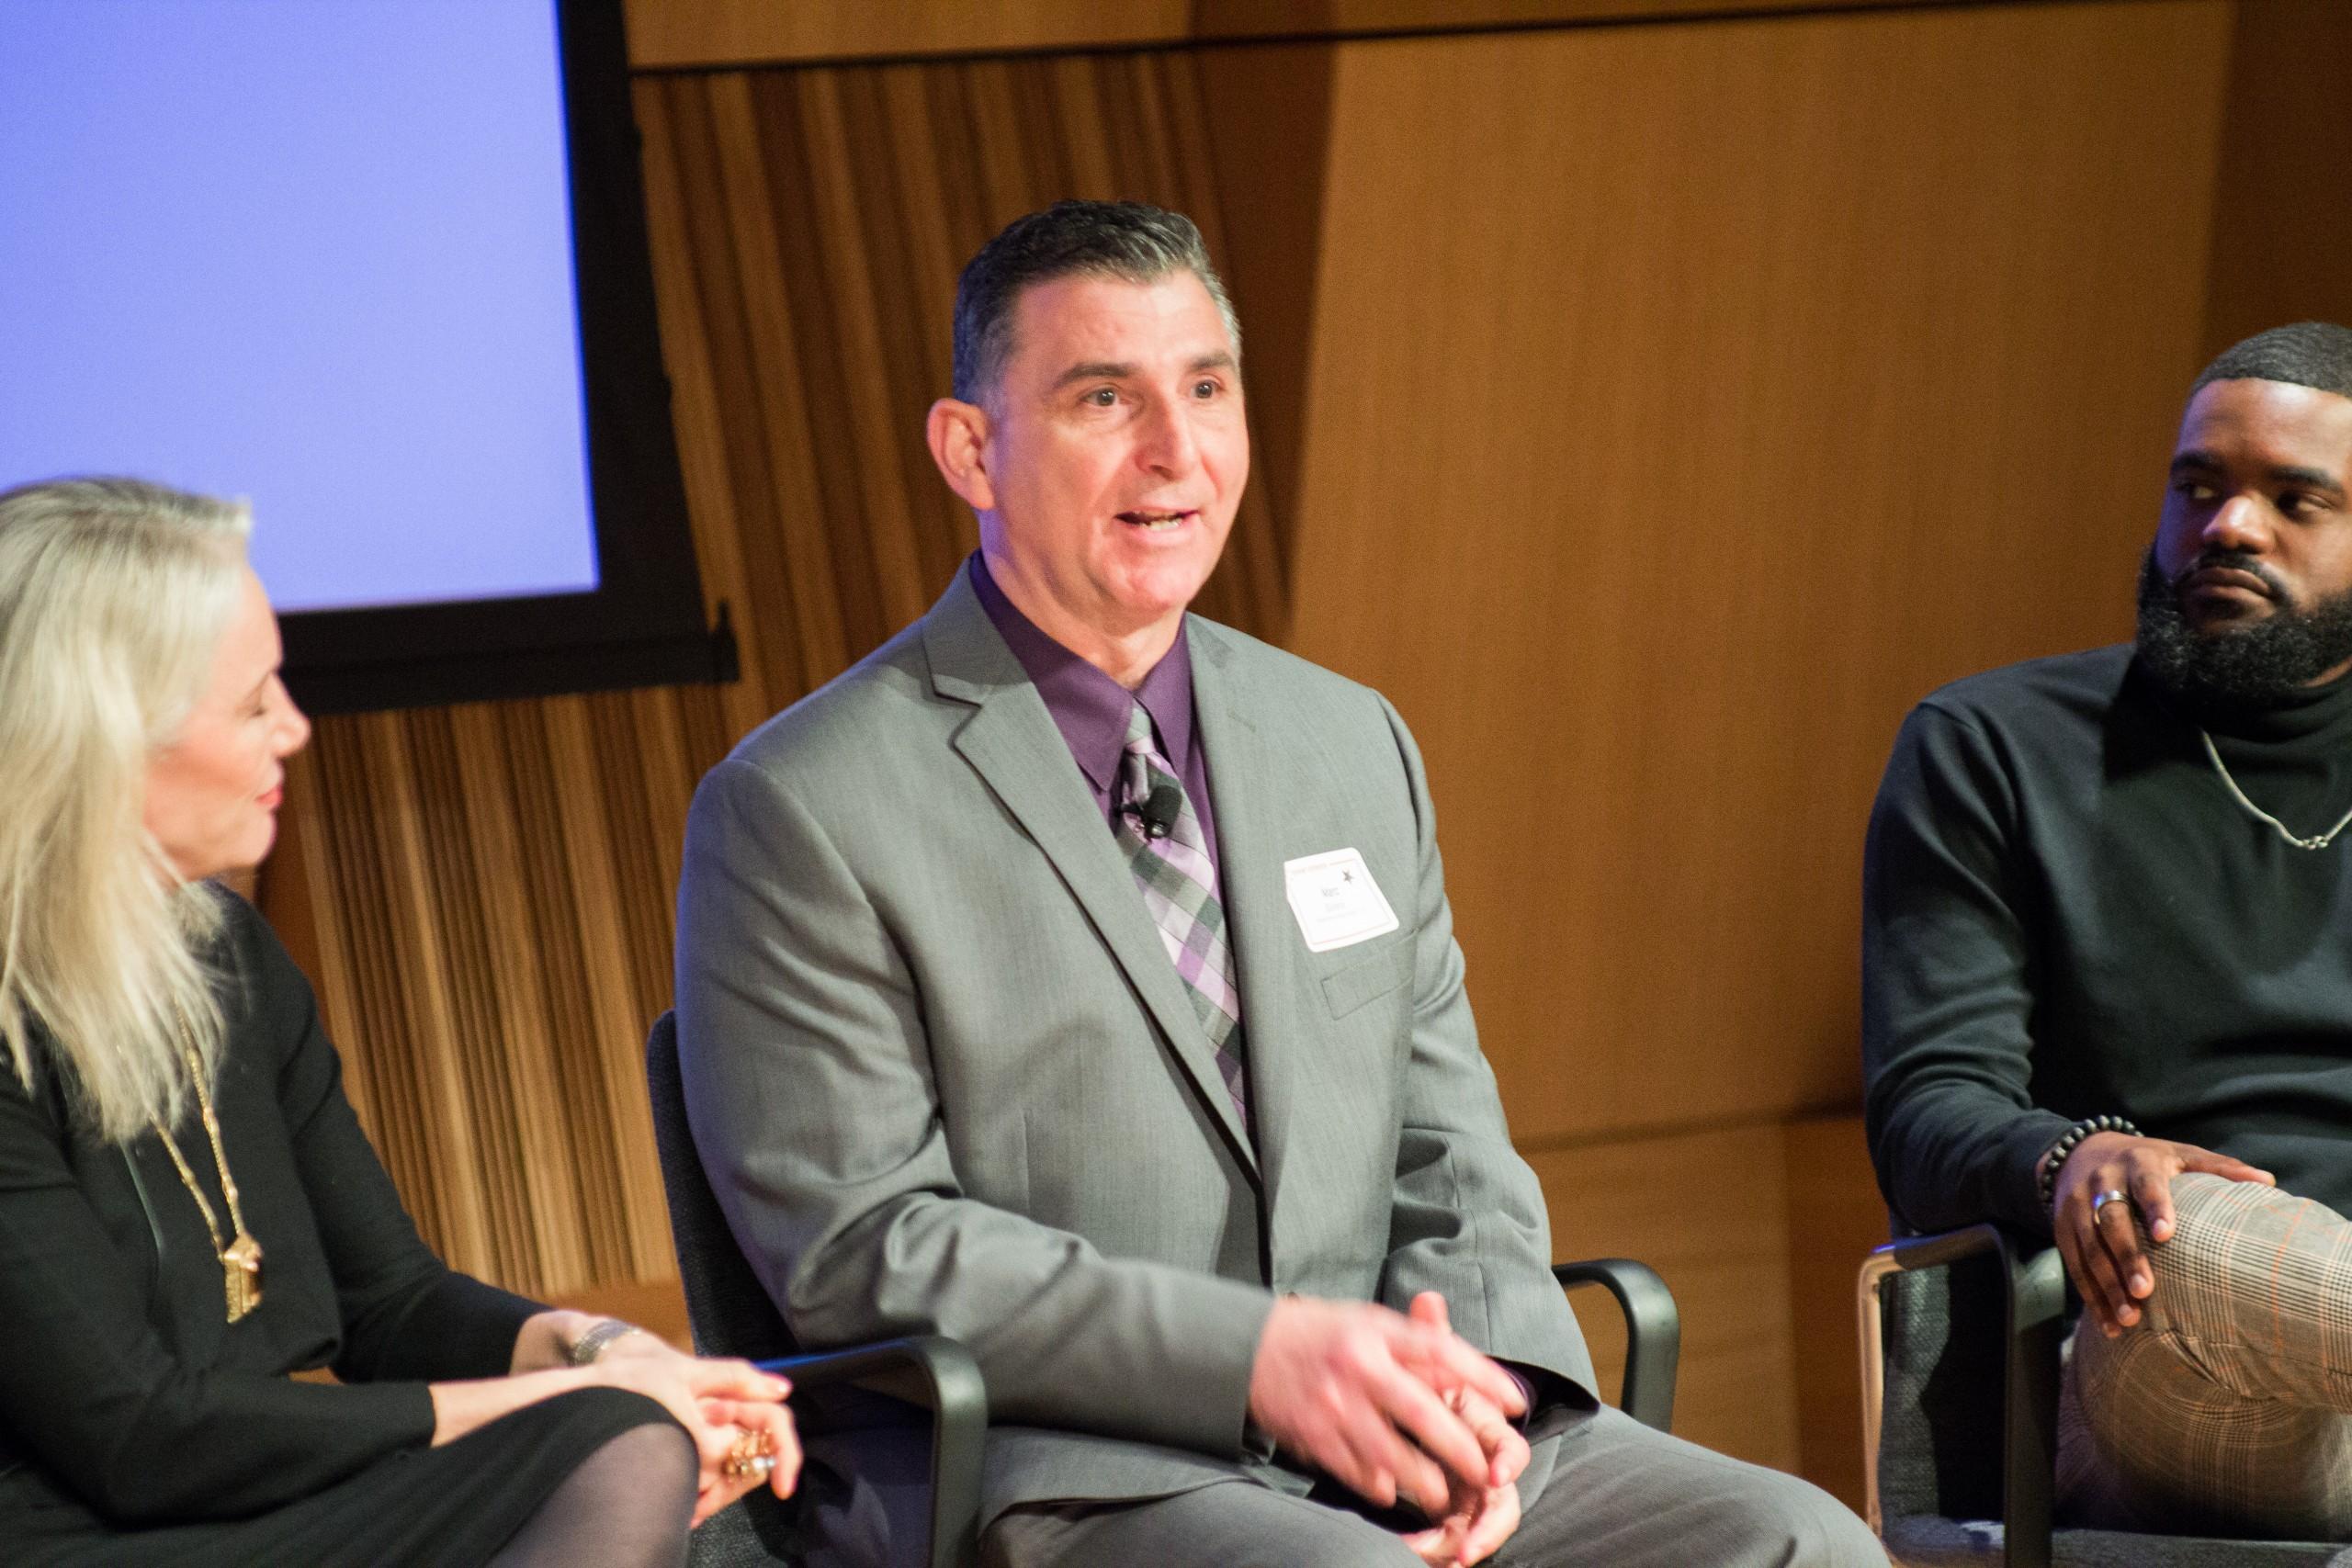 Photo of Defining Innovation speakers sitting on stage speaking